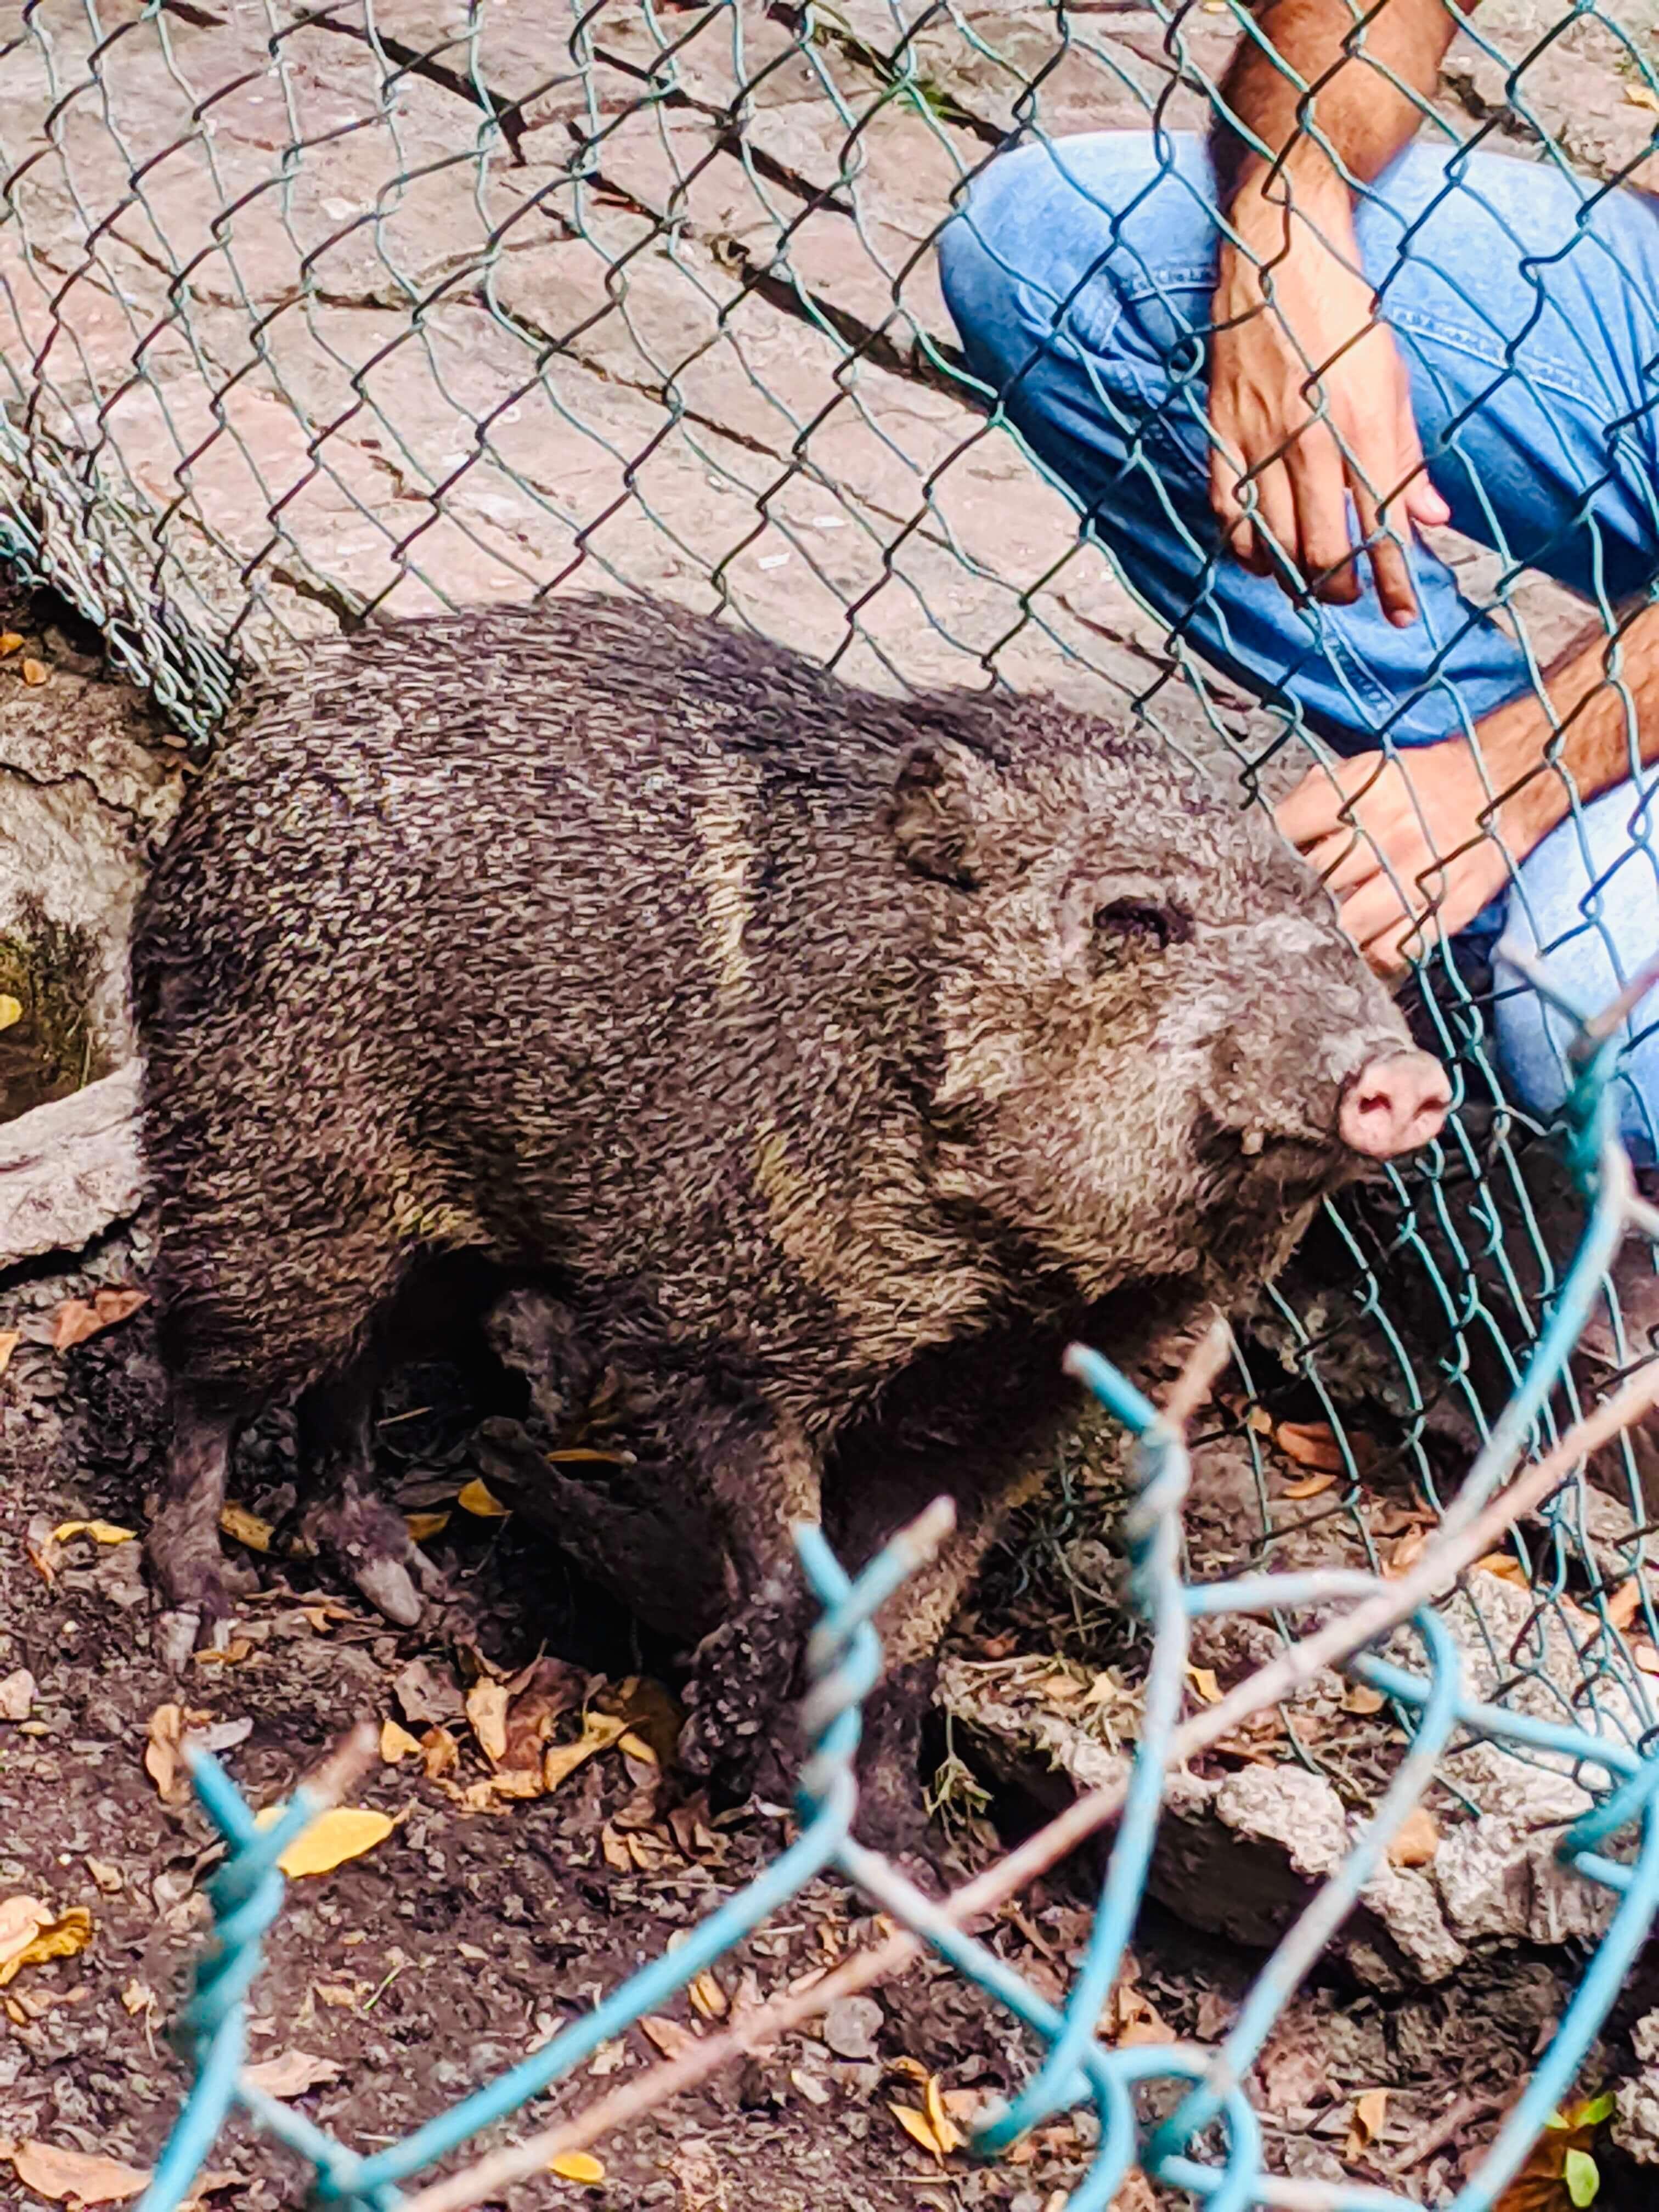 A small hog, enjoying getting pet